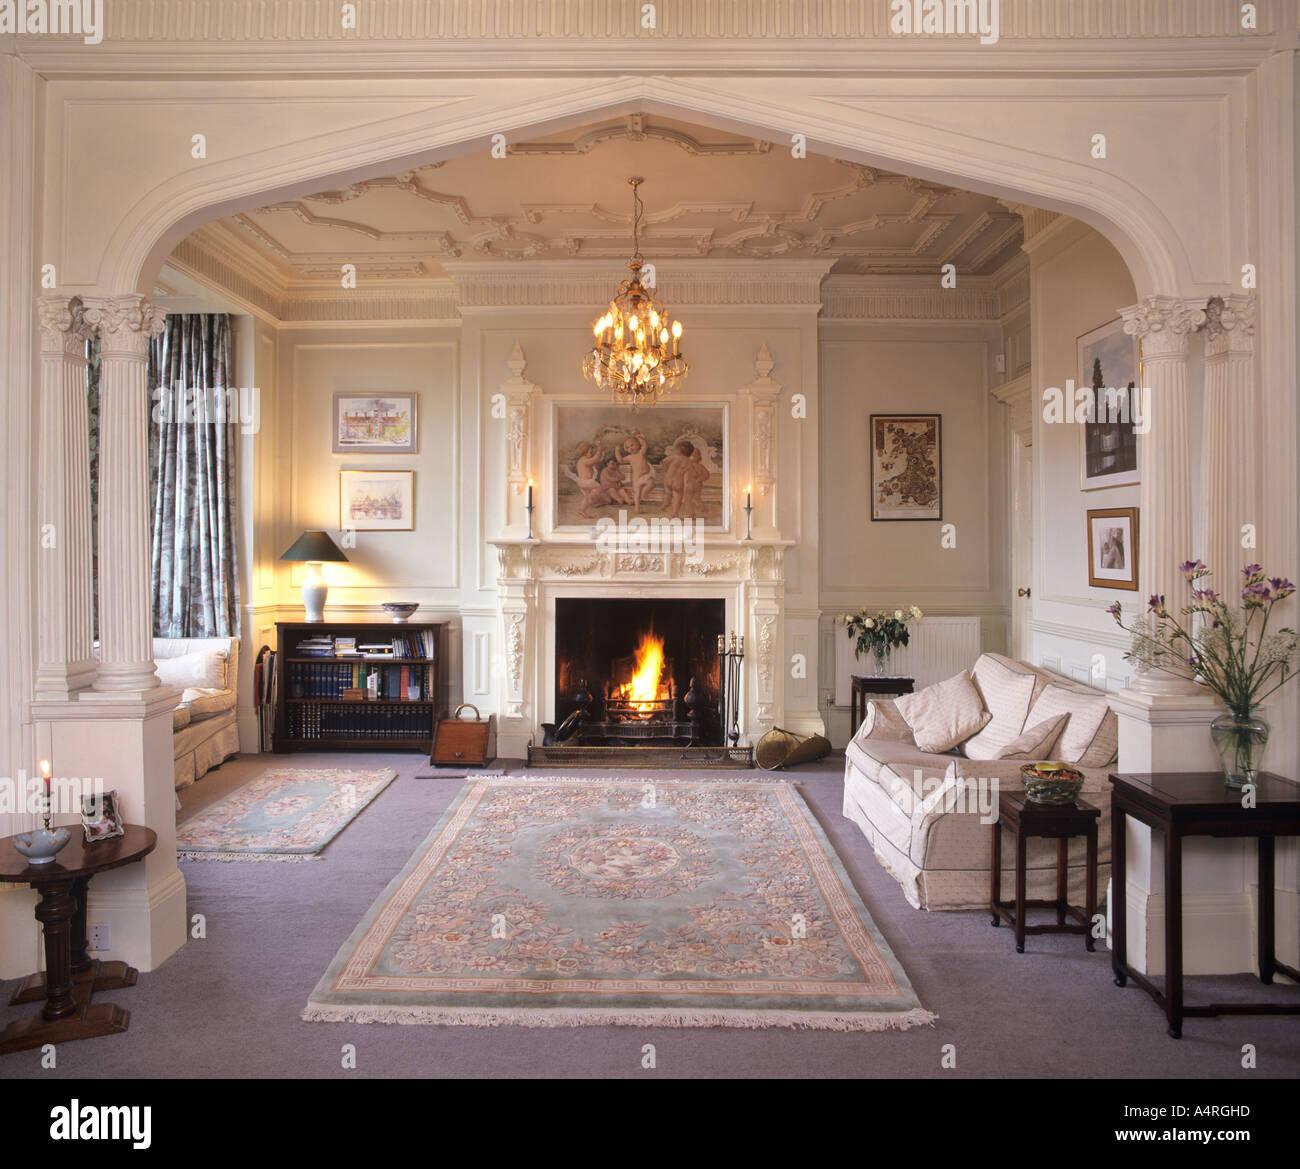 Salon interieur landhaus england stockfoto bild for Interieur english